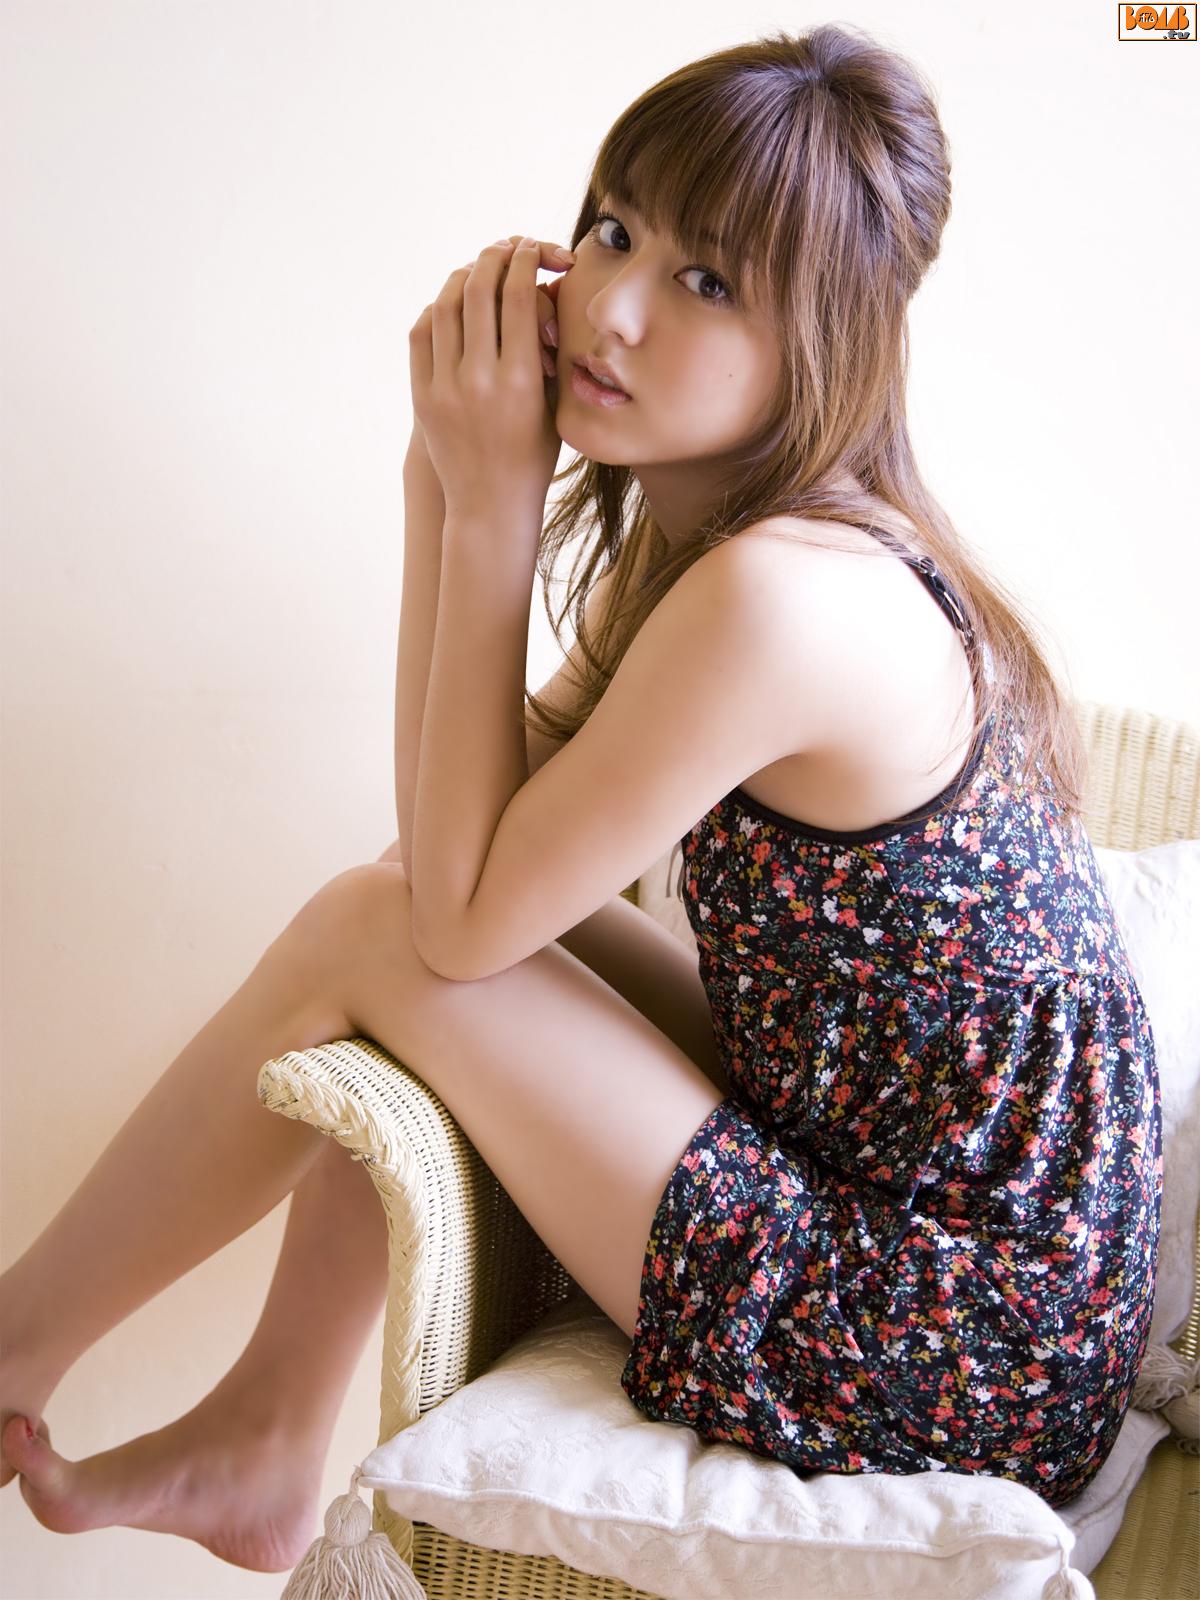 [Bomb.tv] 2008.10 Yumi Sugimoto 杉本有美 [34P139MB]